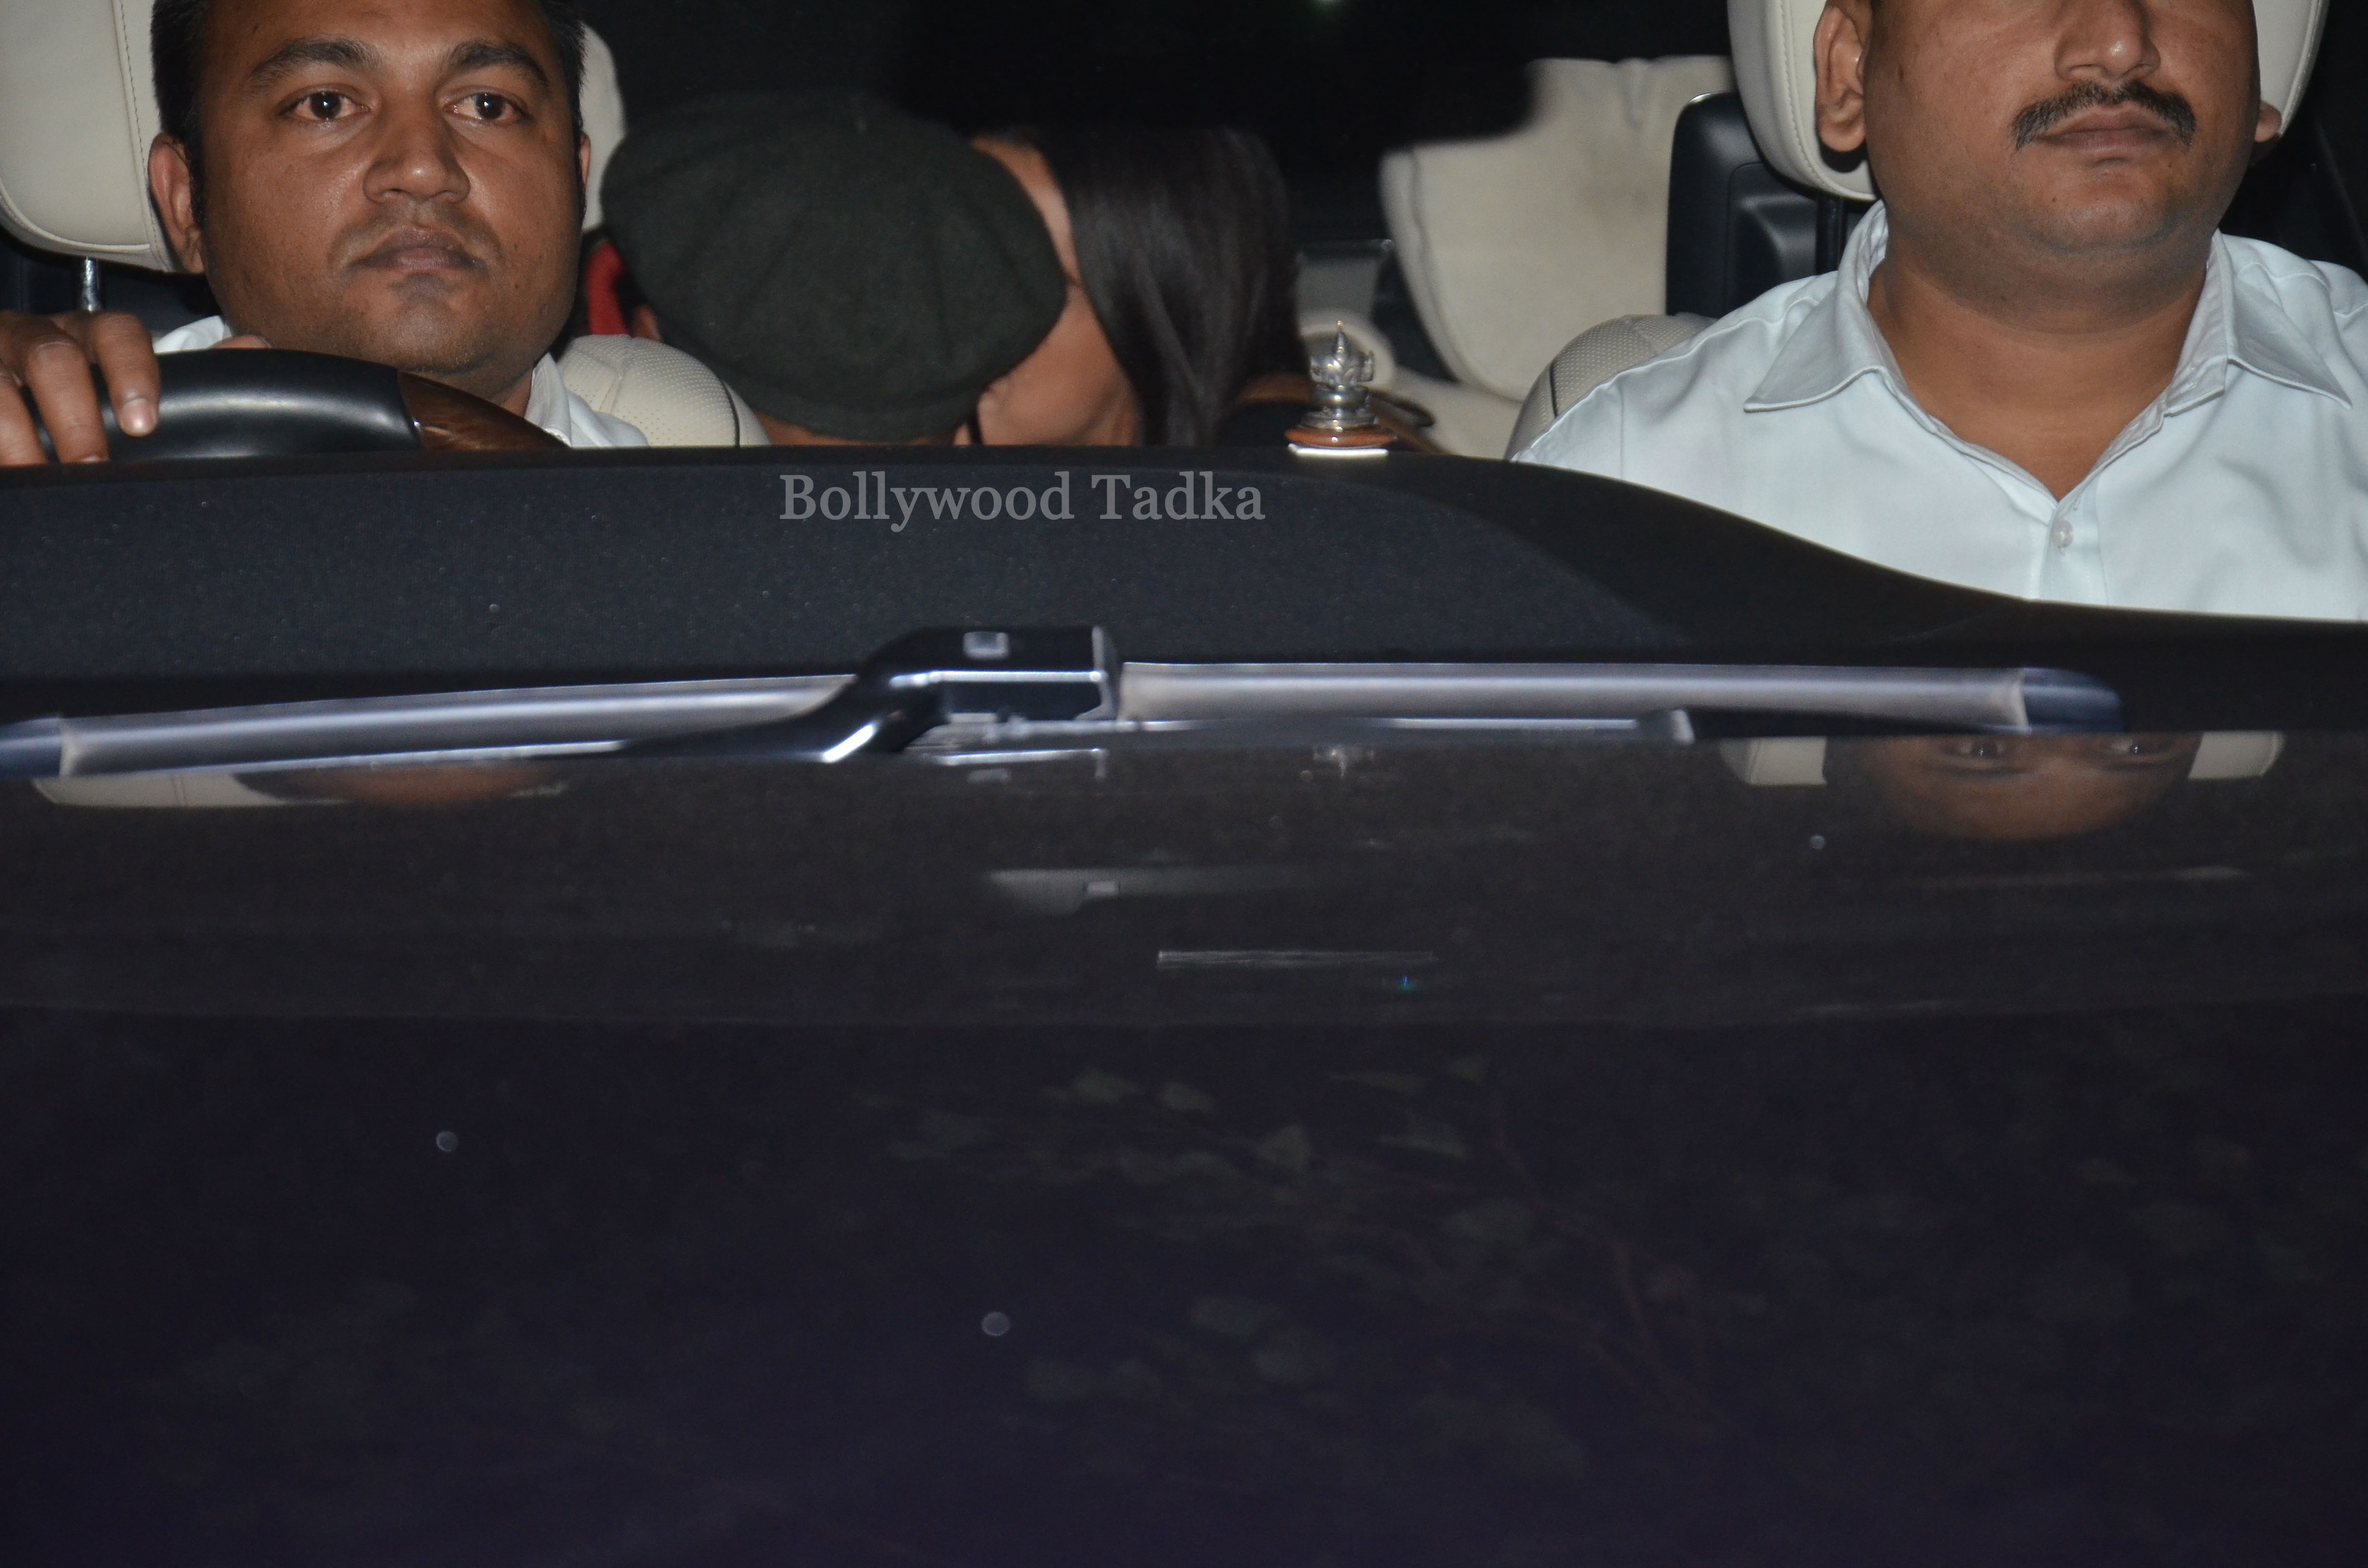 Bollywood Tadka, रणवीर सिंह इमेज, रणवीर सिंह फोटो, रणवीर सिंह पिक्चर, दीपिका पादुकोण इमेज, दीपिका पादुकोण फोटो, दीपिका पादुकोण पिक्चर